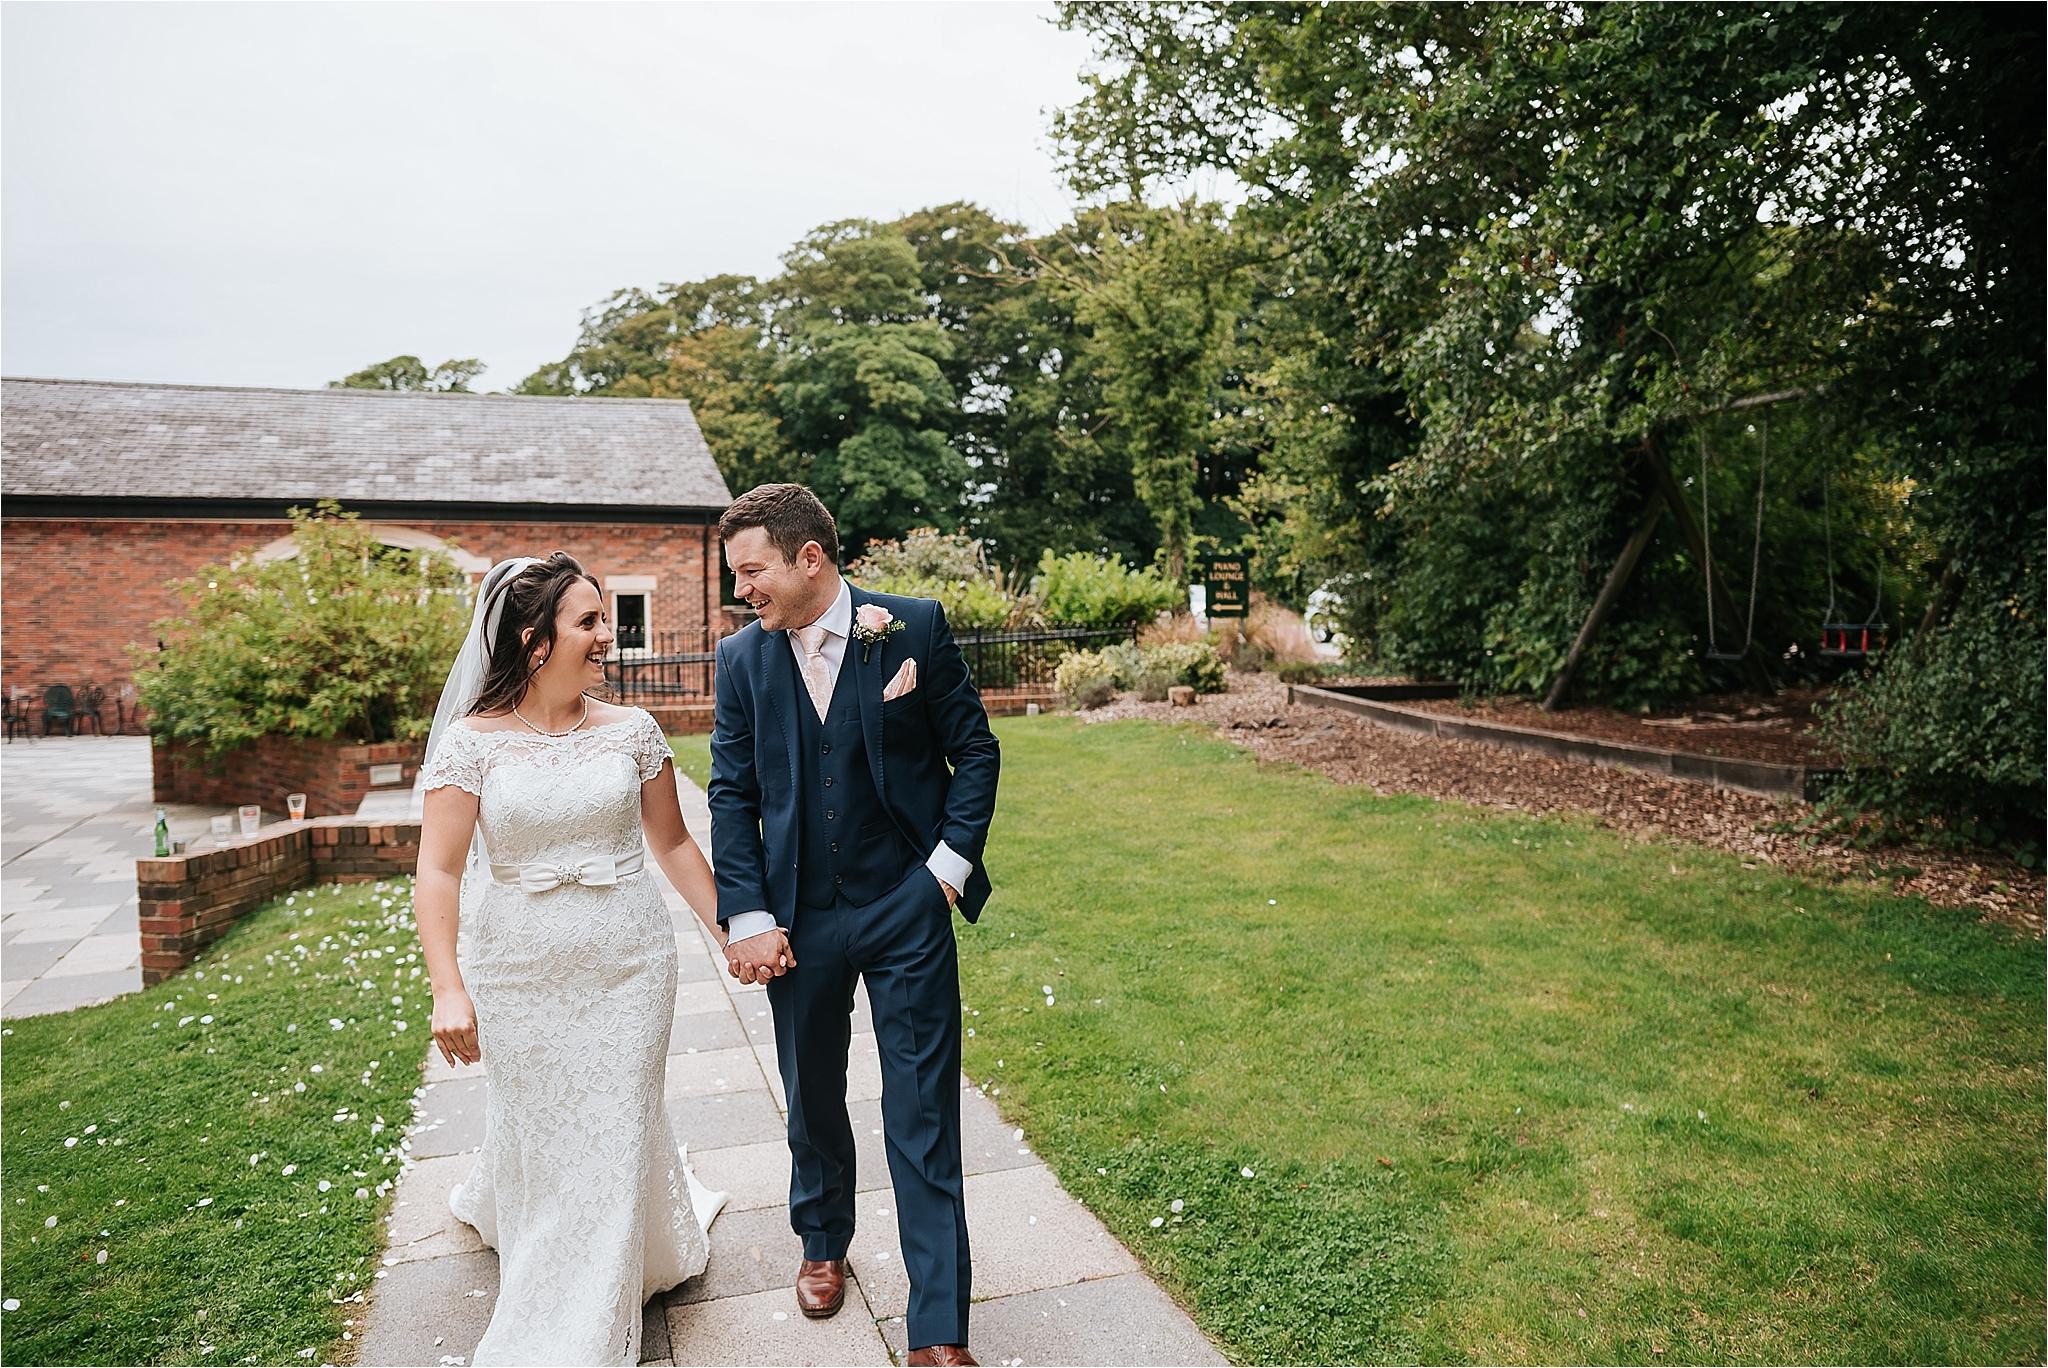 thevilla+lancashire+wreagreen+wedding+photographer102.jpg